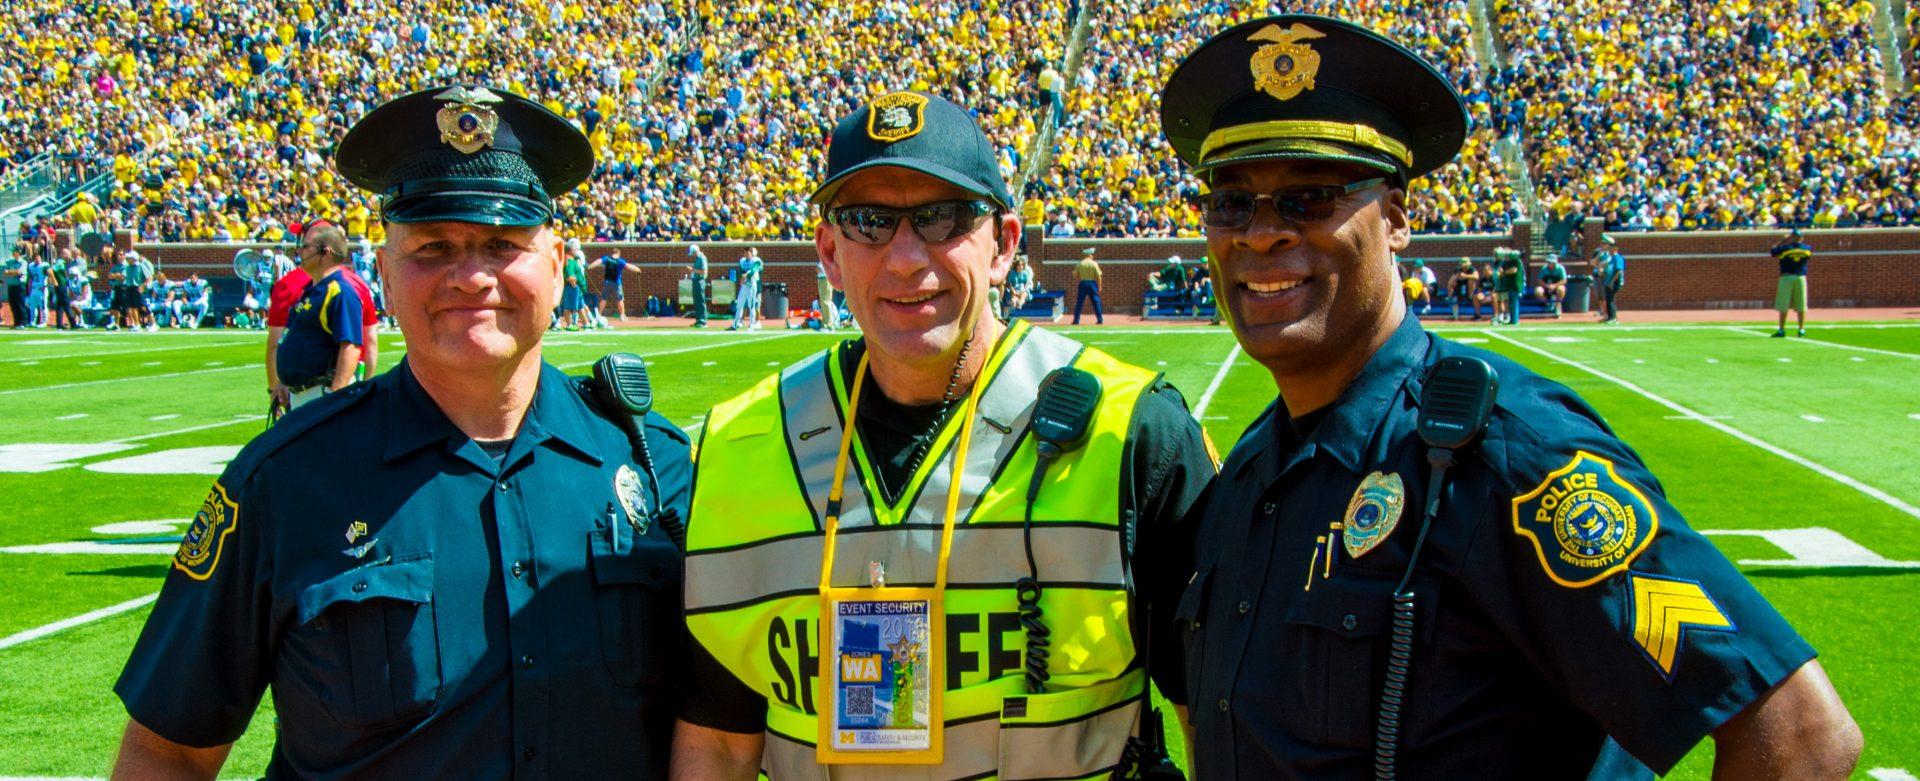 Officer Garry Veld, WSCO Sgt. David Archer and Sgt. Gary Hicks